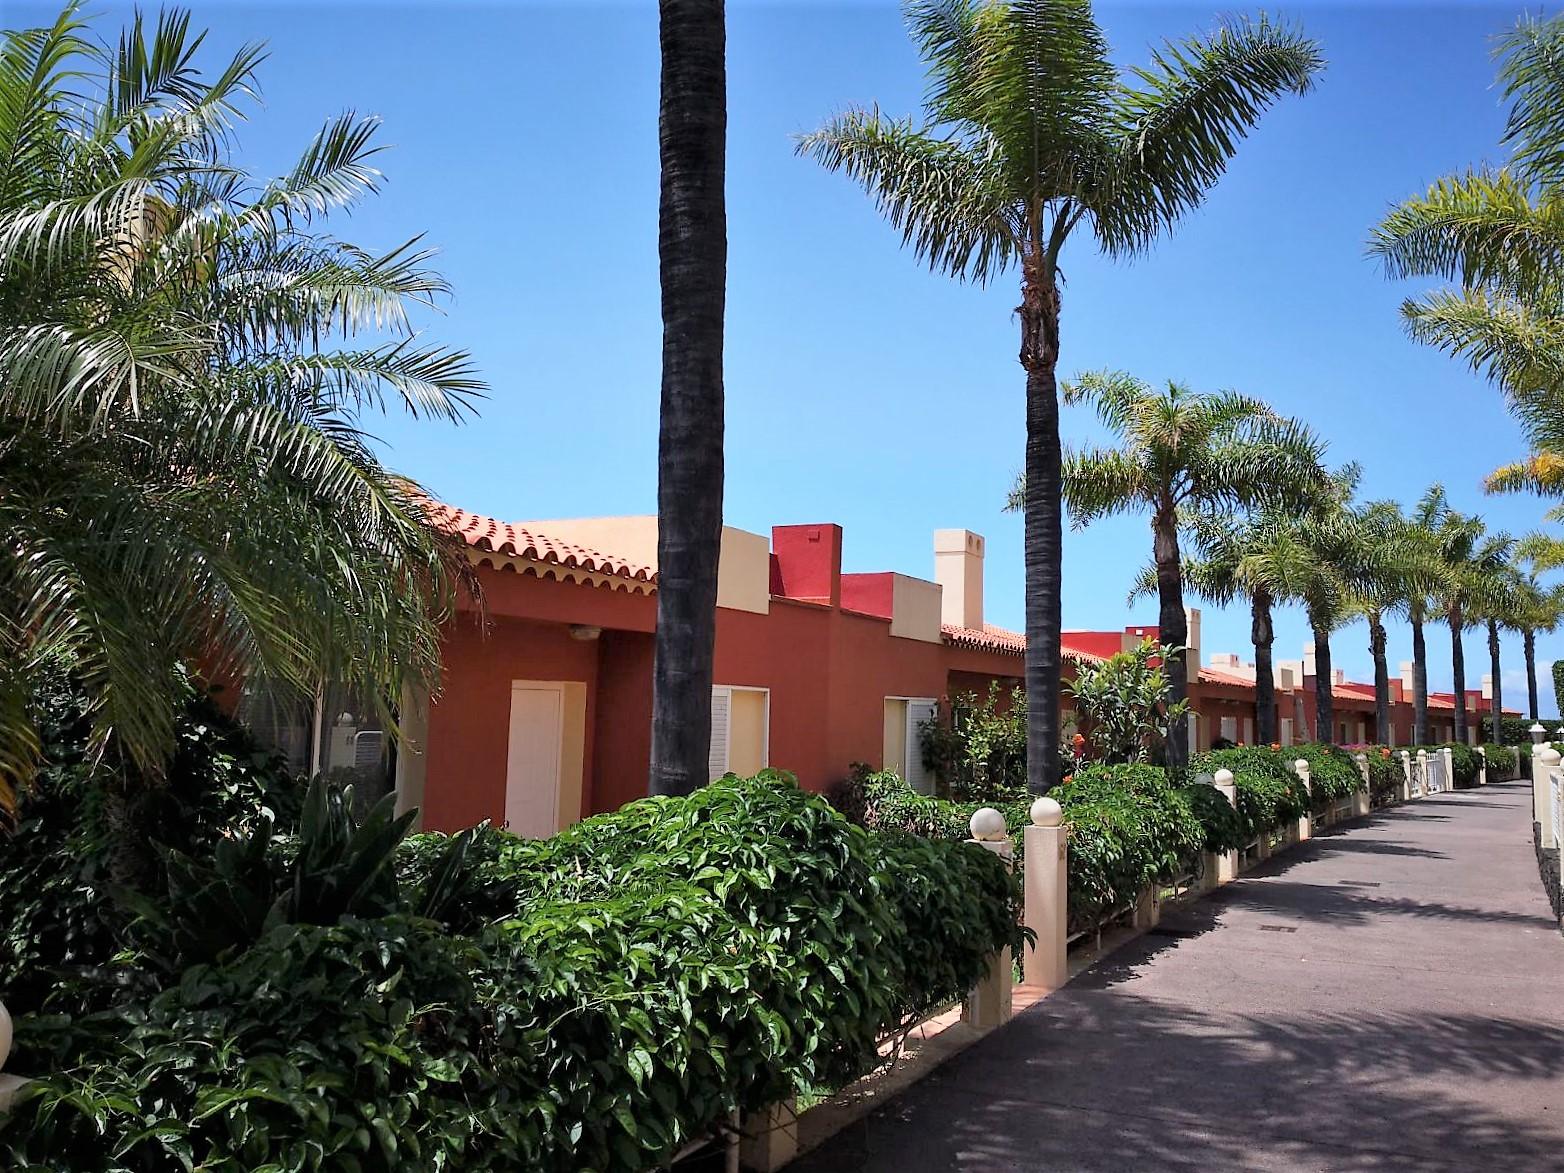 Ferienhaus Teneriffa Nord La Quinta Außenanlage